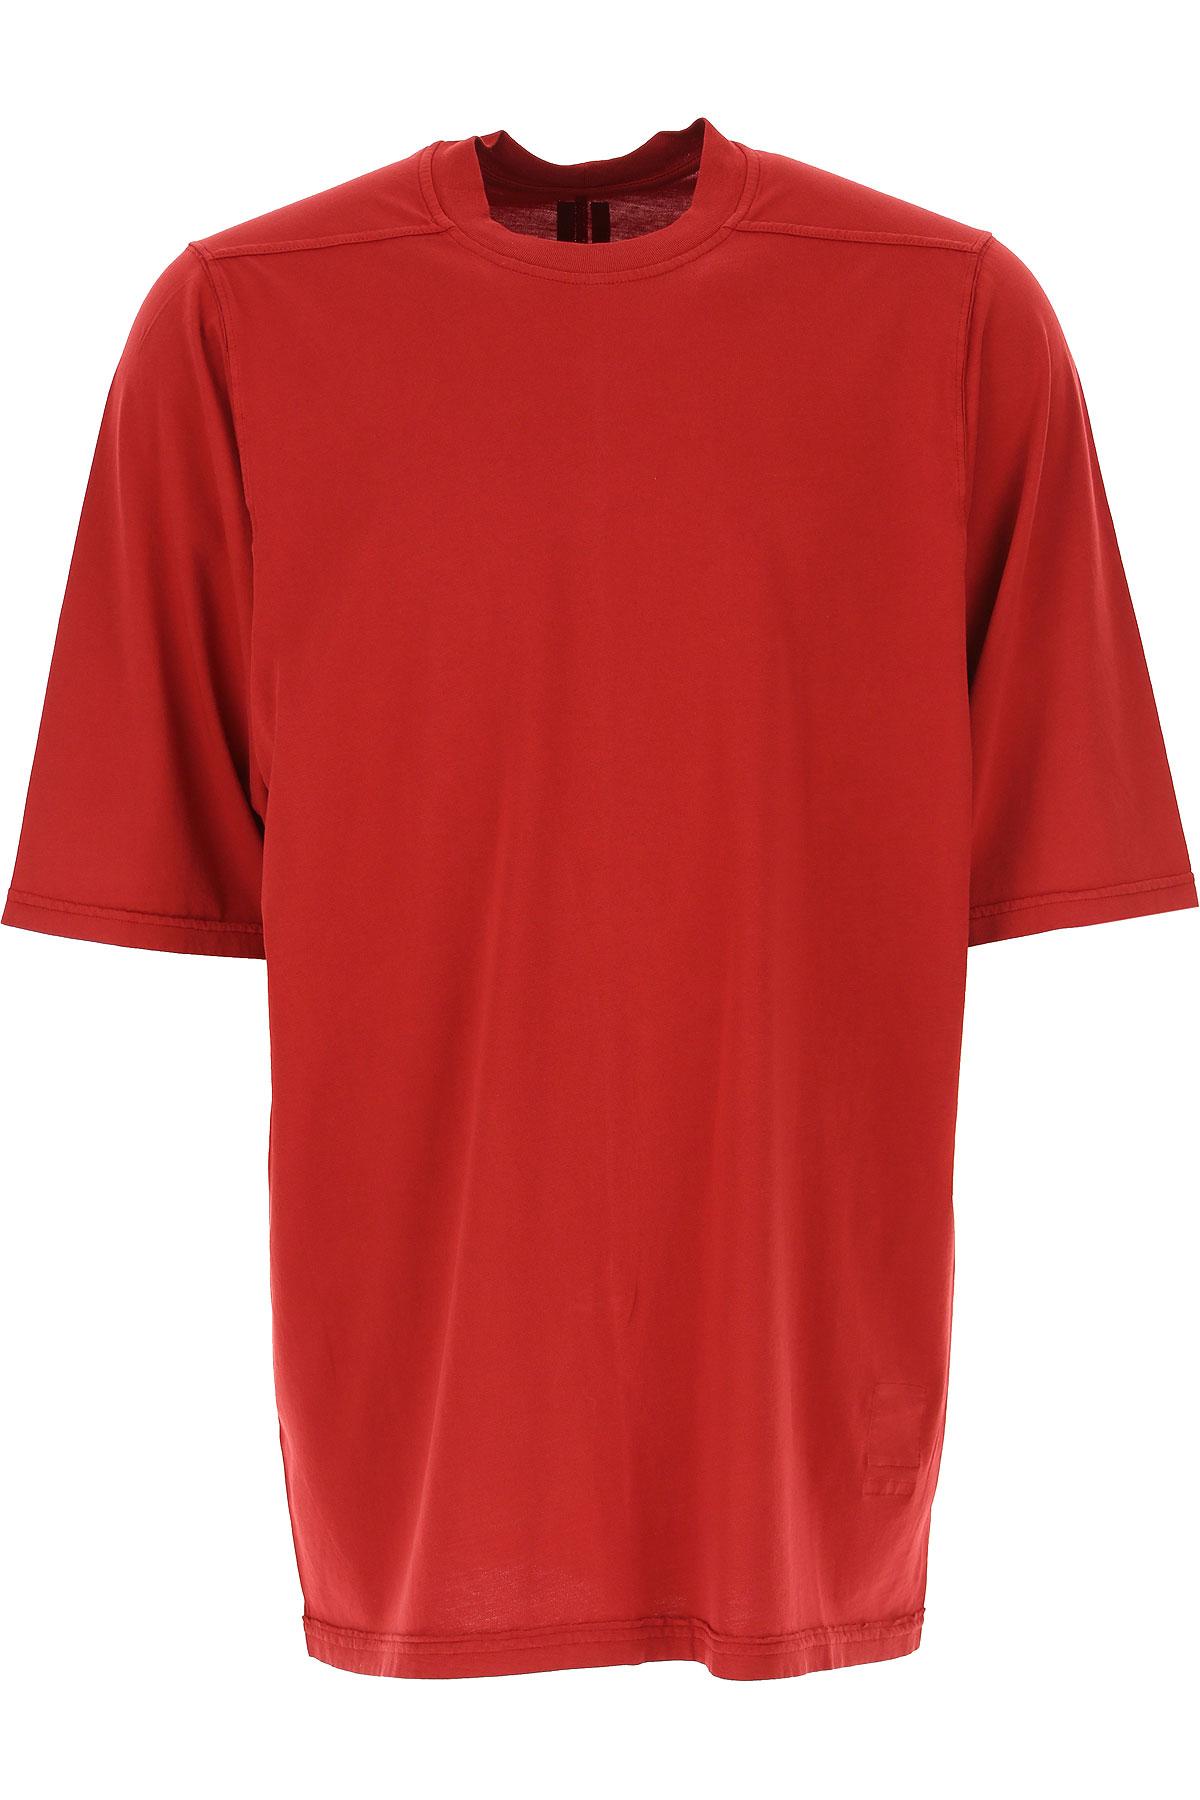 Rick Owens DRKSHDW T-Shirt for Men On Sale, Red, Cotton, 2019, M S